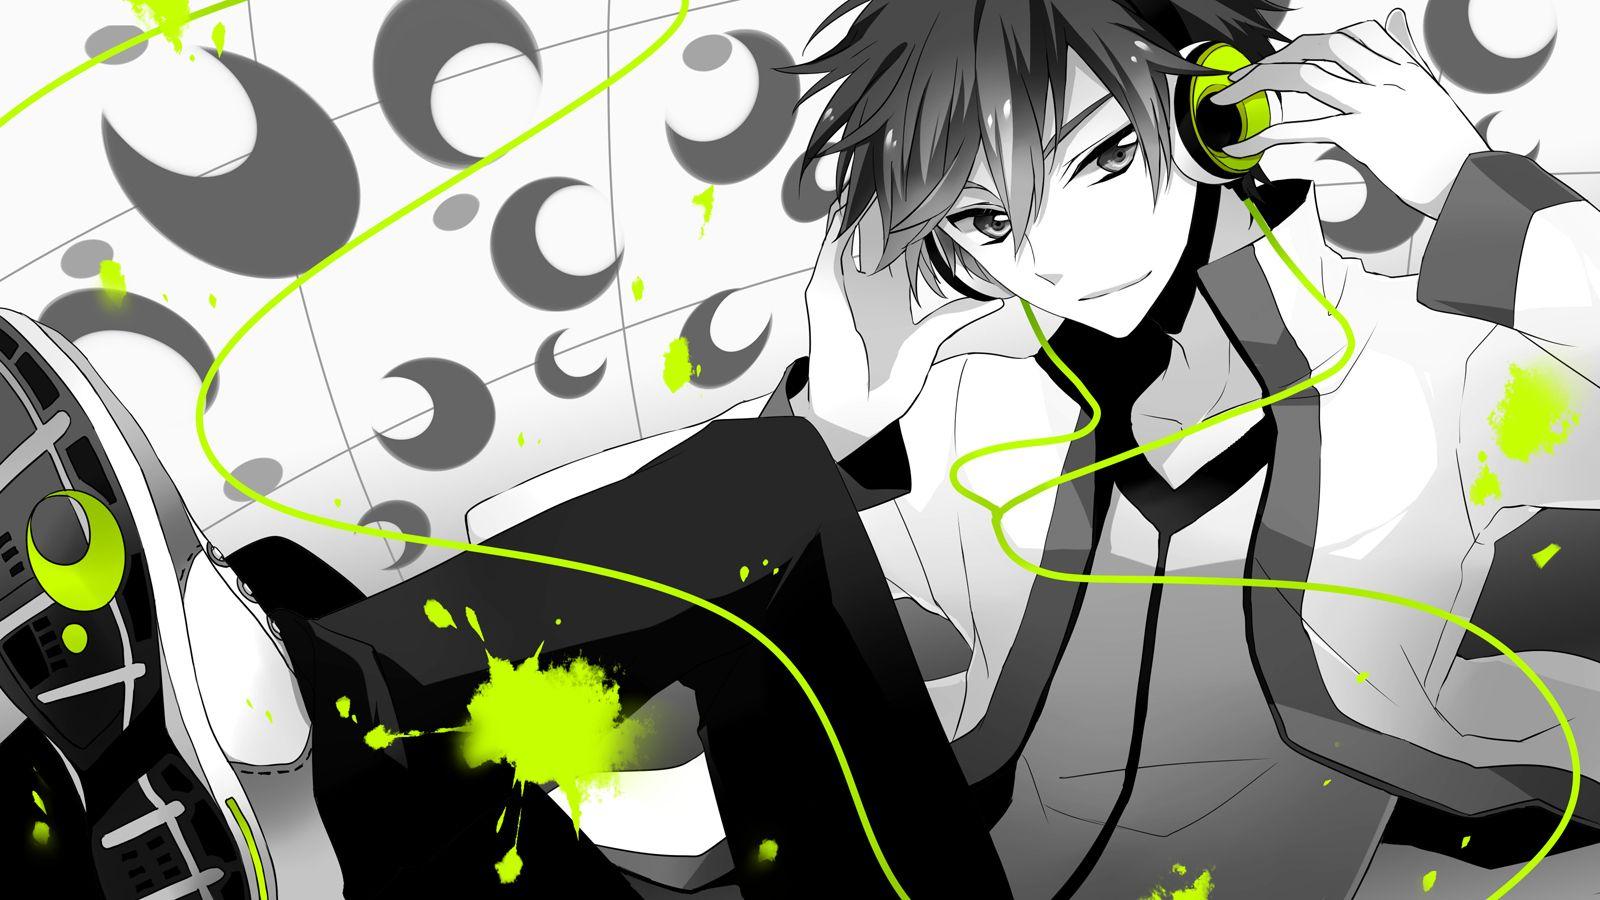 Anime Guy Headphones Wallpaper Hd Widescreen 11 HD